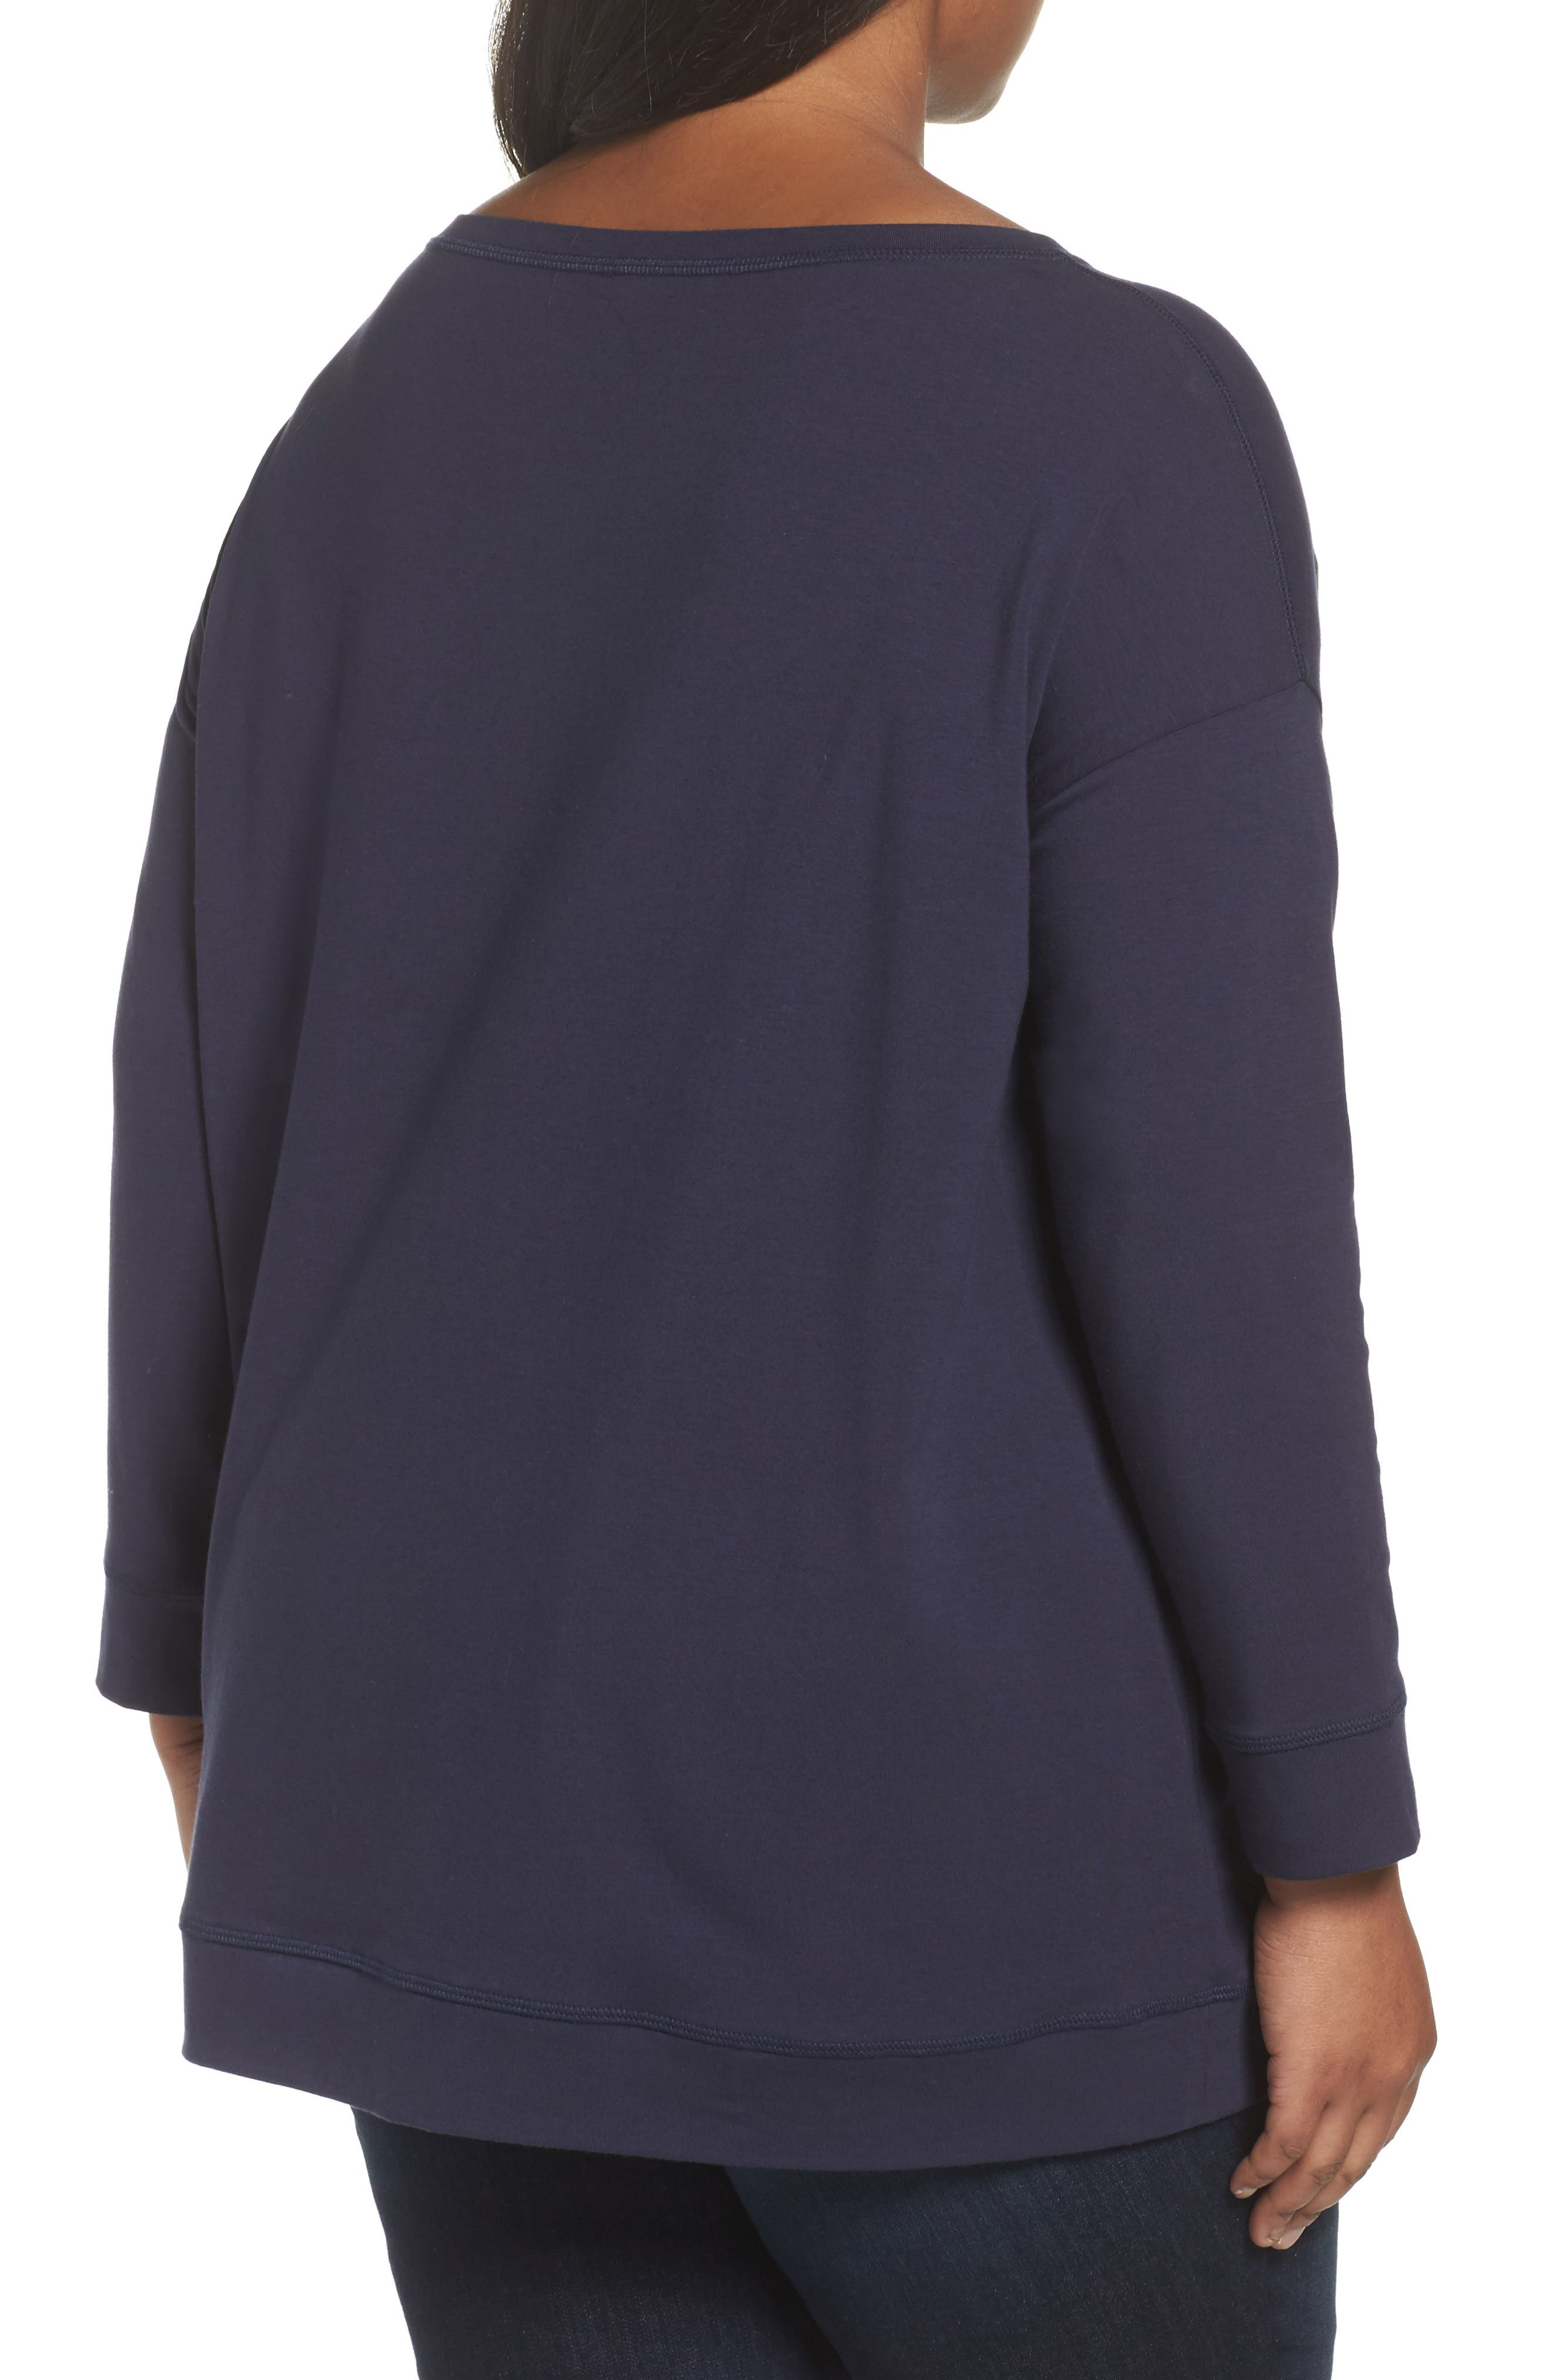 Alternate Image 2  - Eileen Fisher Jewel Neck Organic Stretch Cotton Tee (Plus Size)